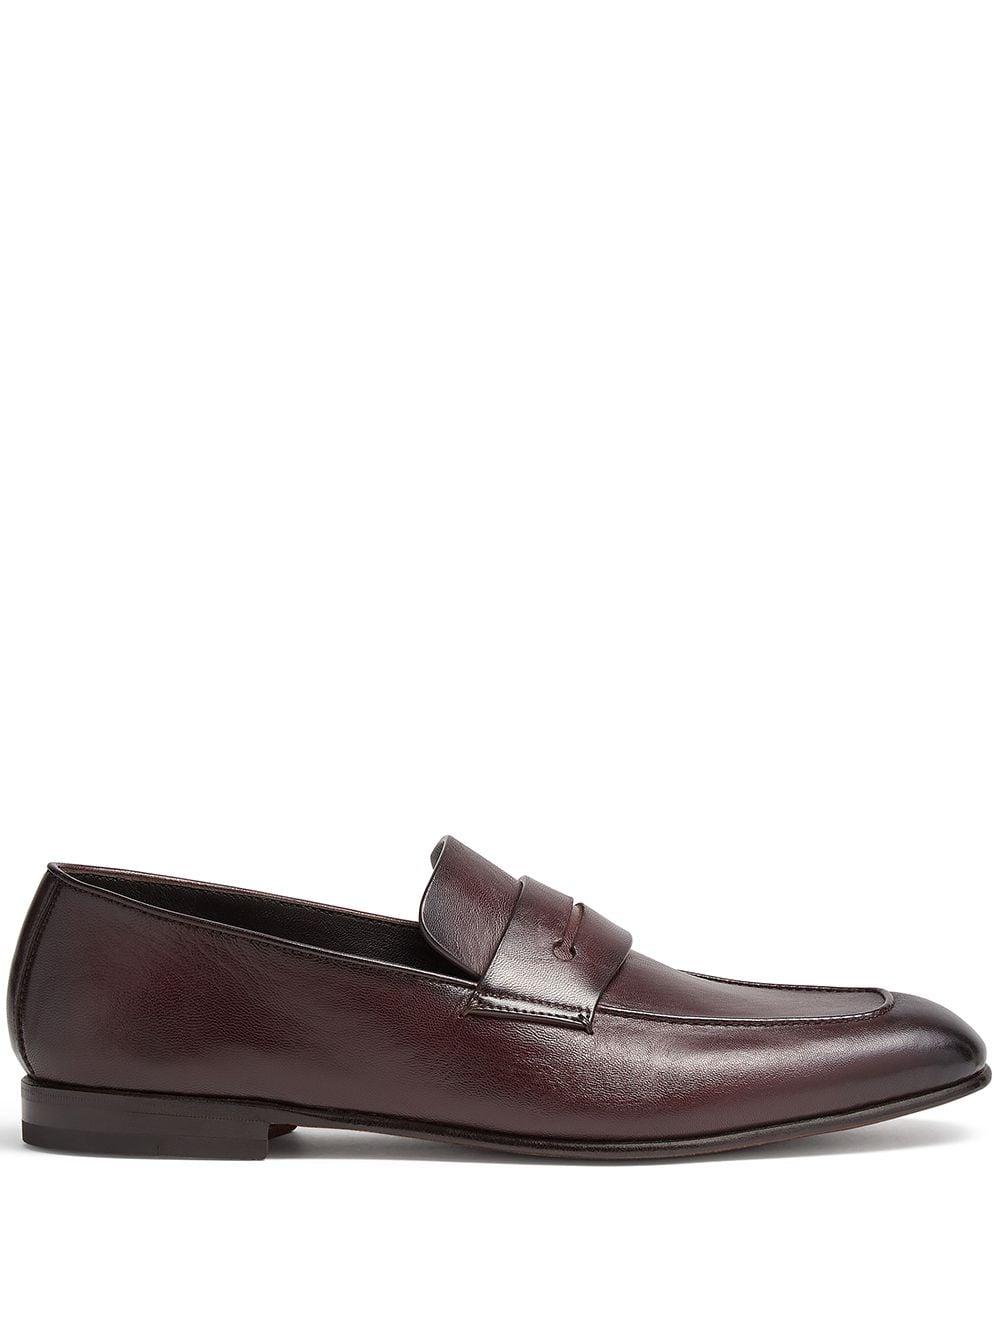 Ermenegildo Zegna Nappa leather loafers - Rot